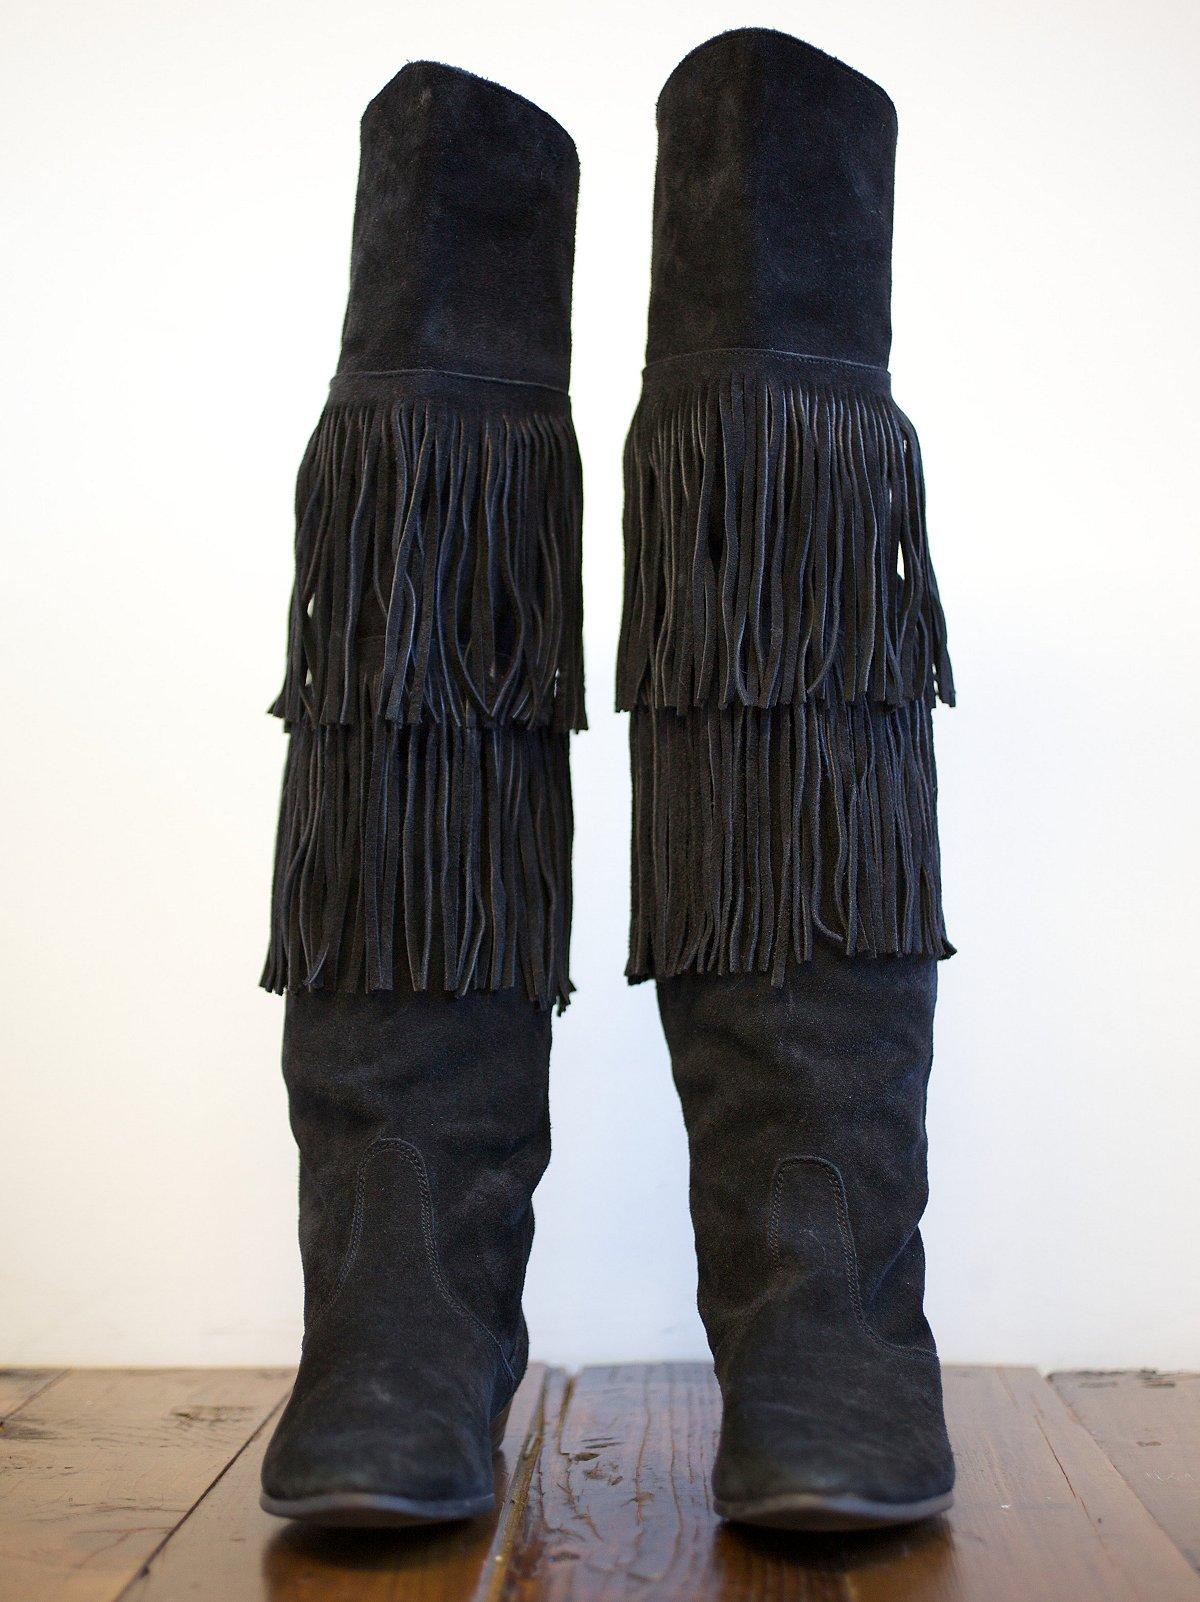 Vintage Tall Fringe Boots